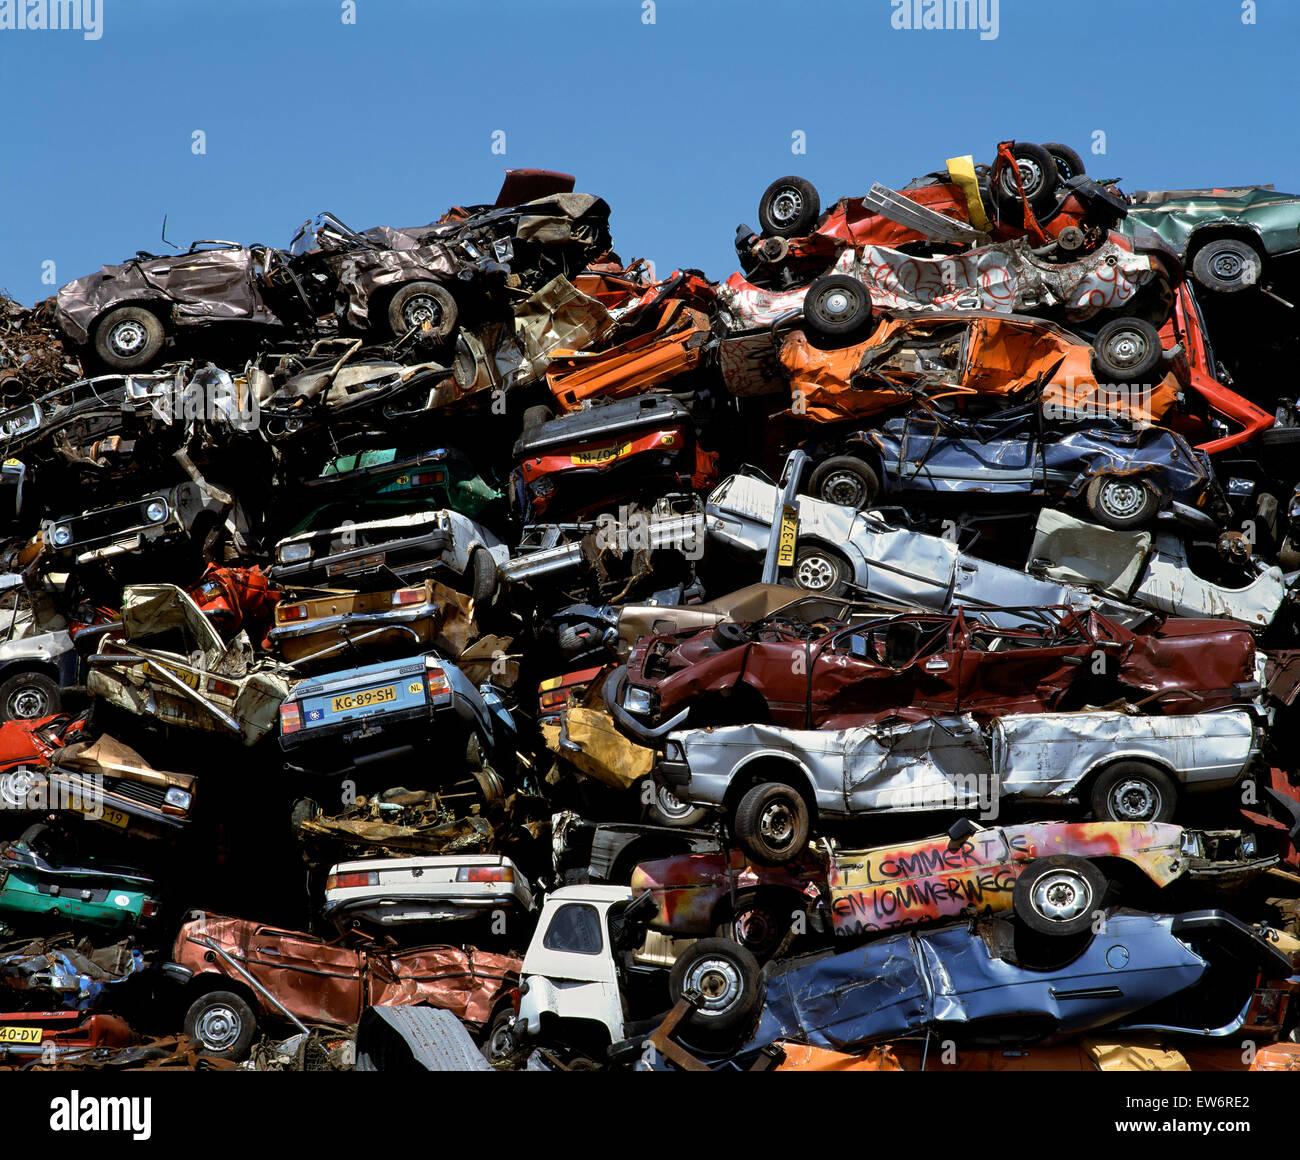 Vehicle scrap yard near Amsterdam Stock Photo, Royalty Free Image ...